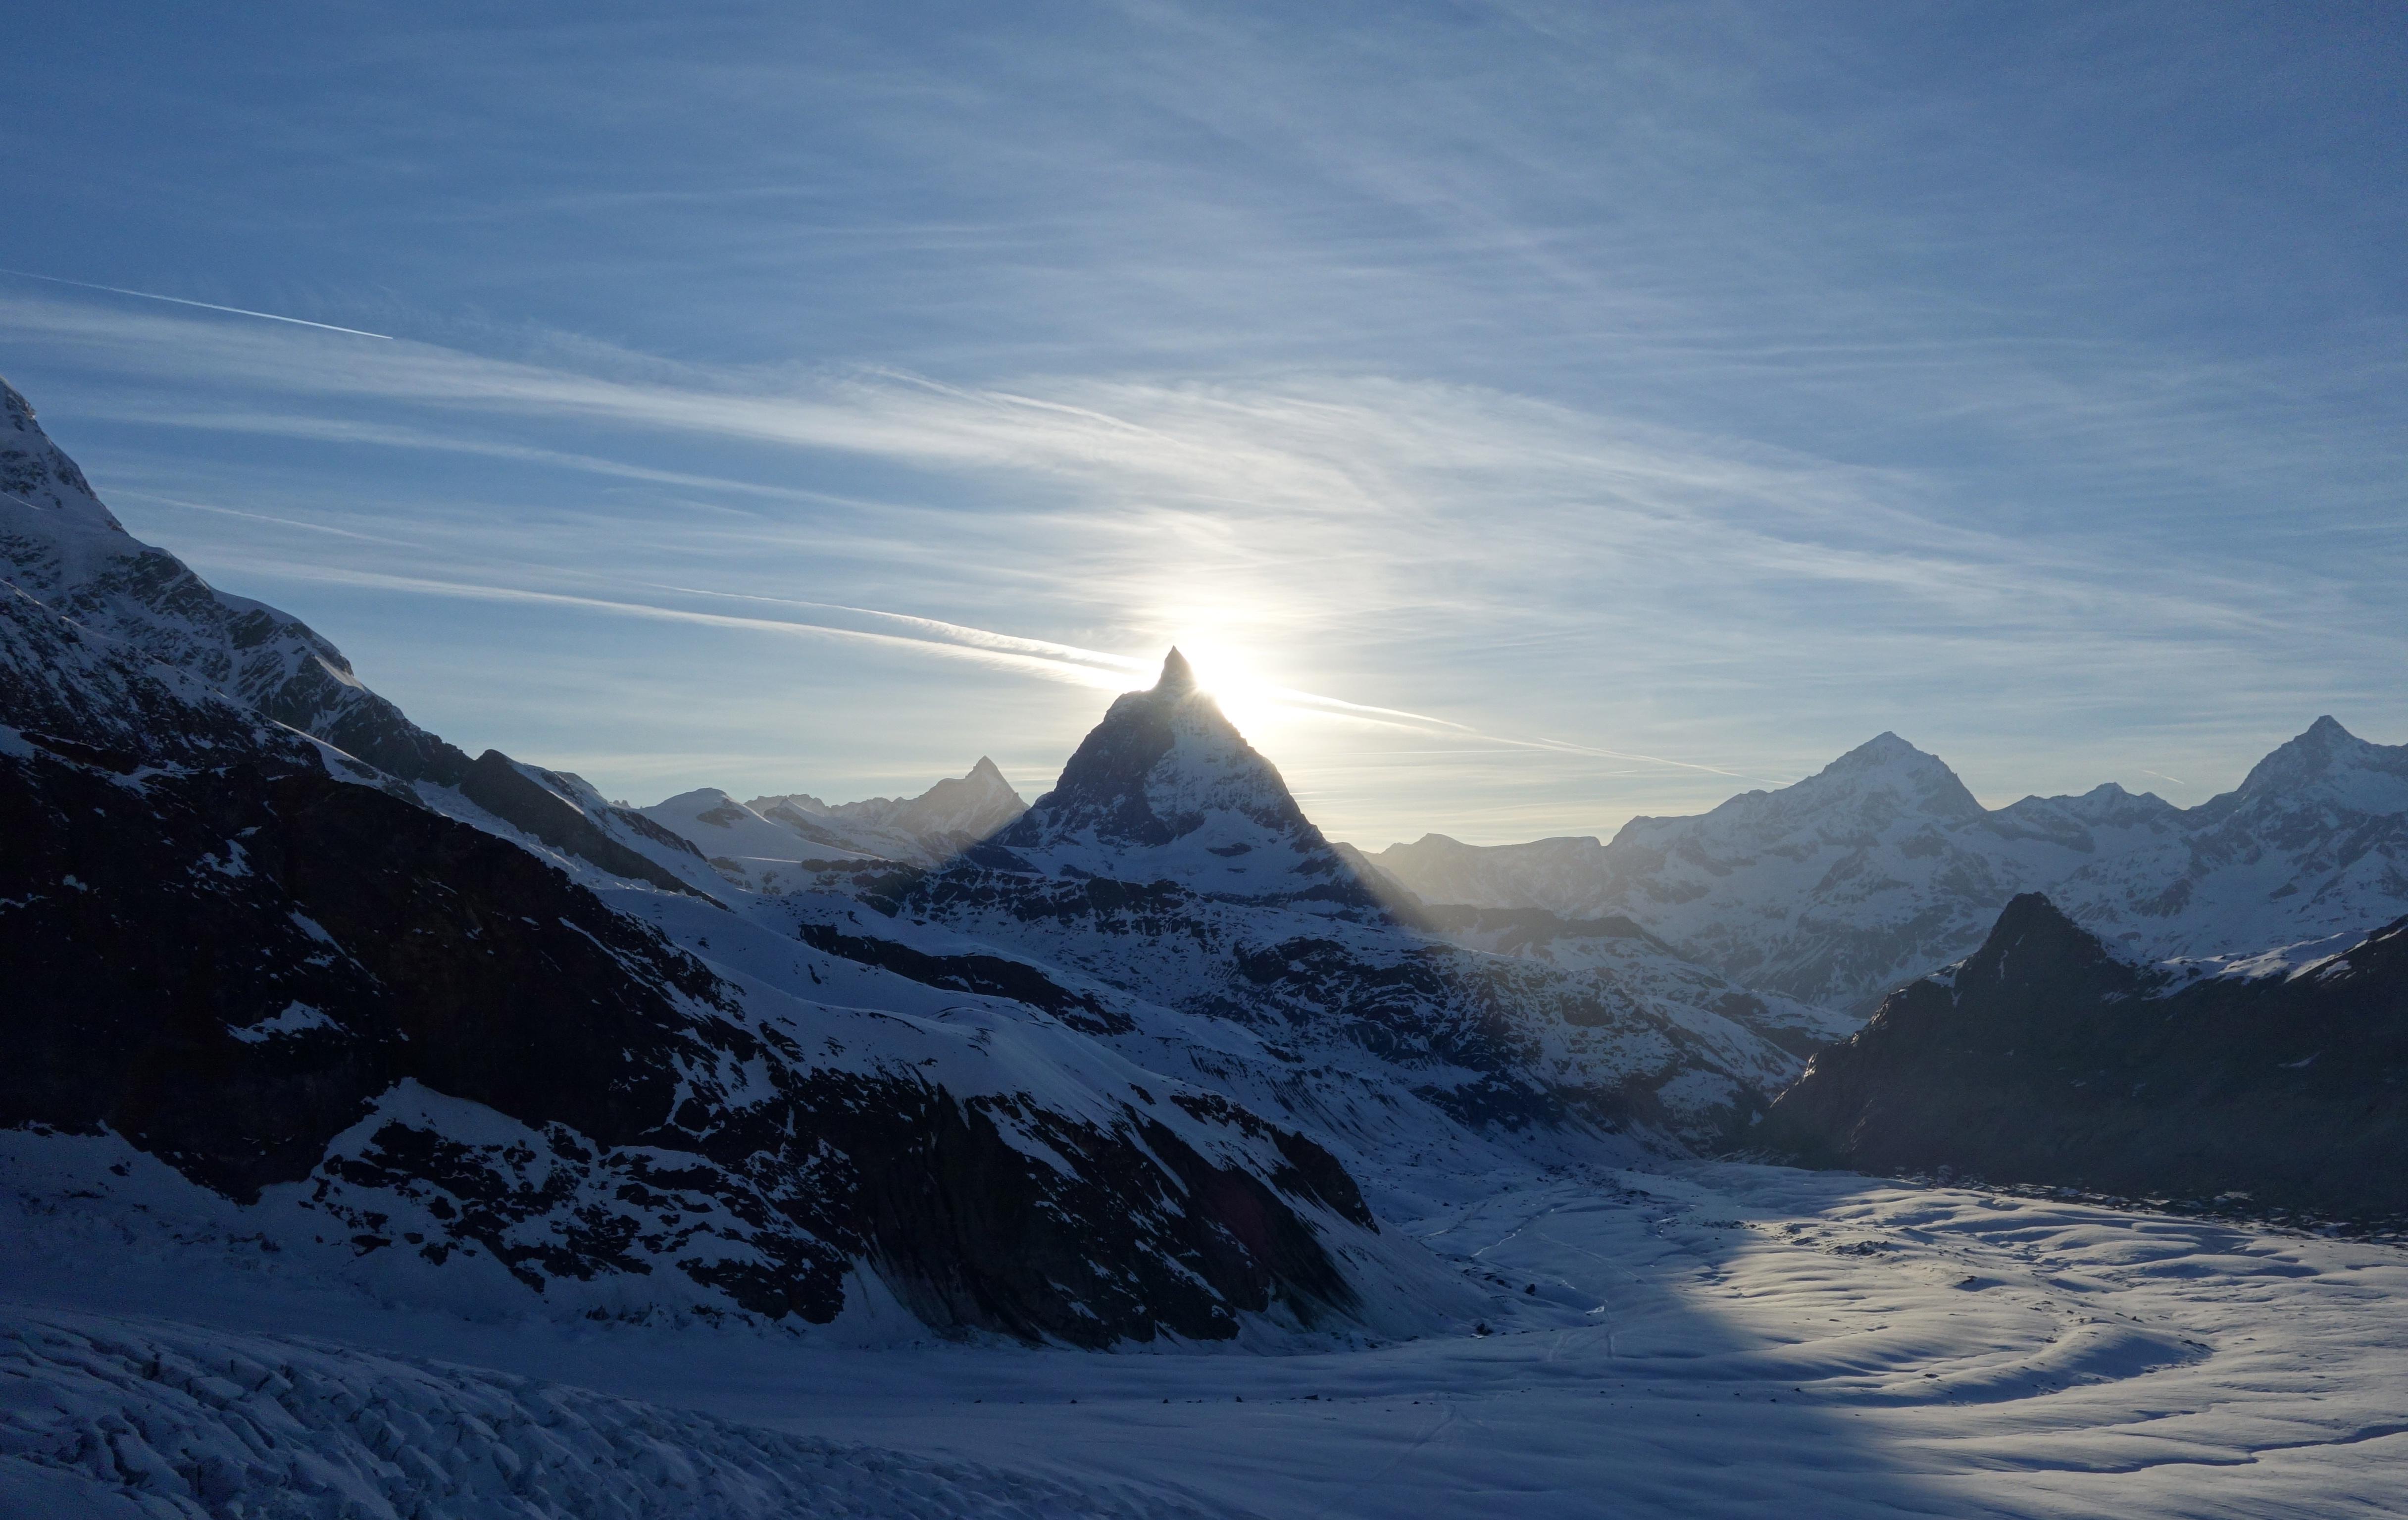 Les 4000m de Zermatt